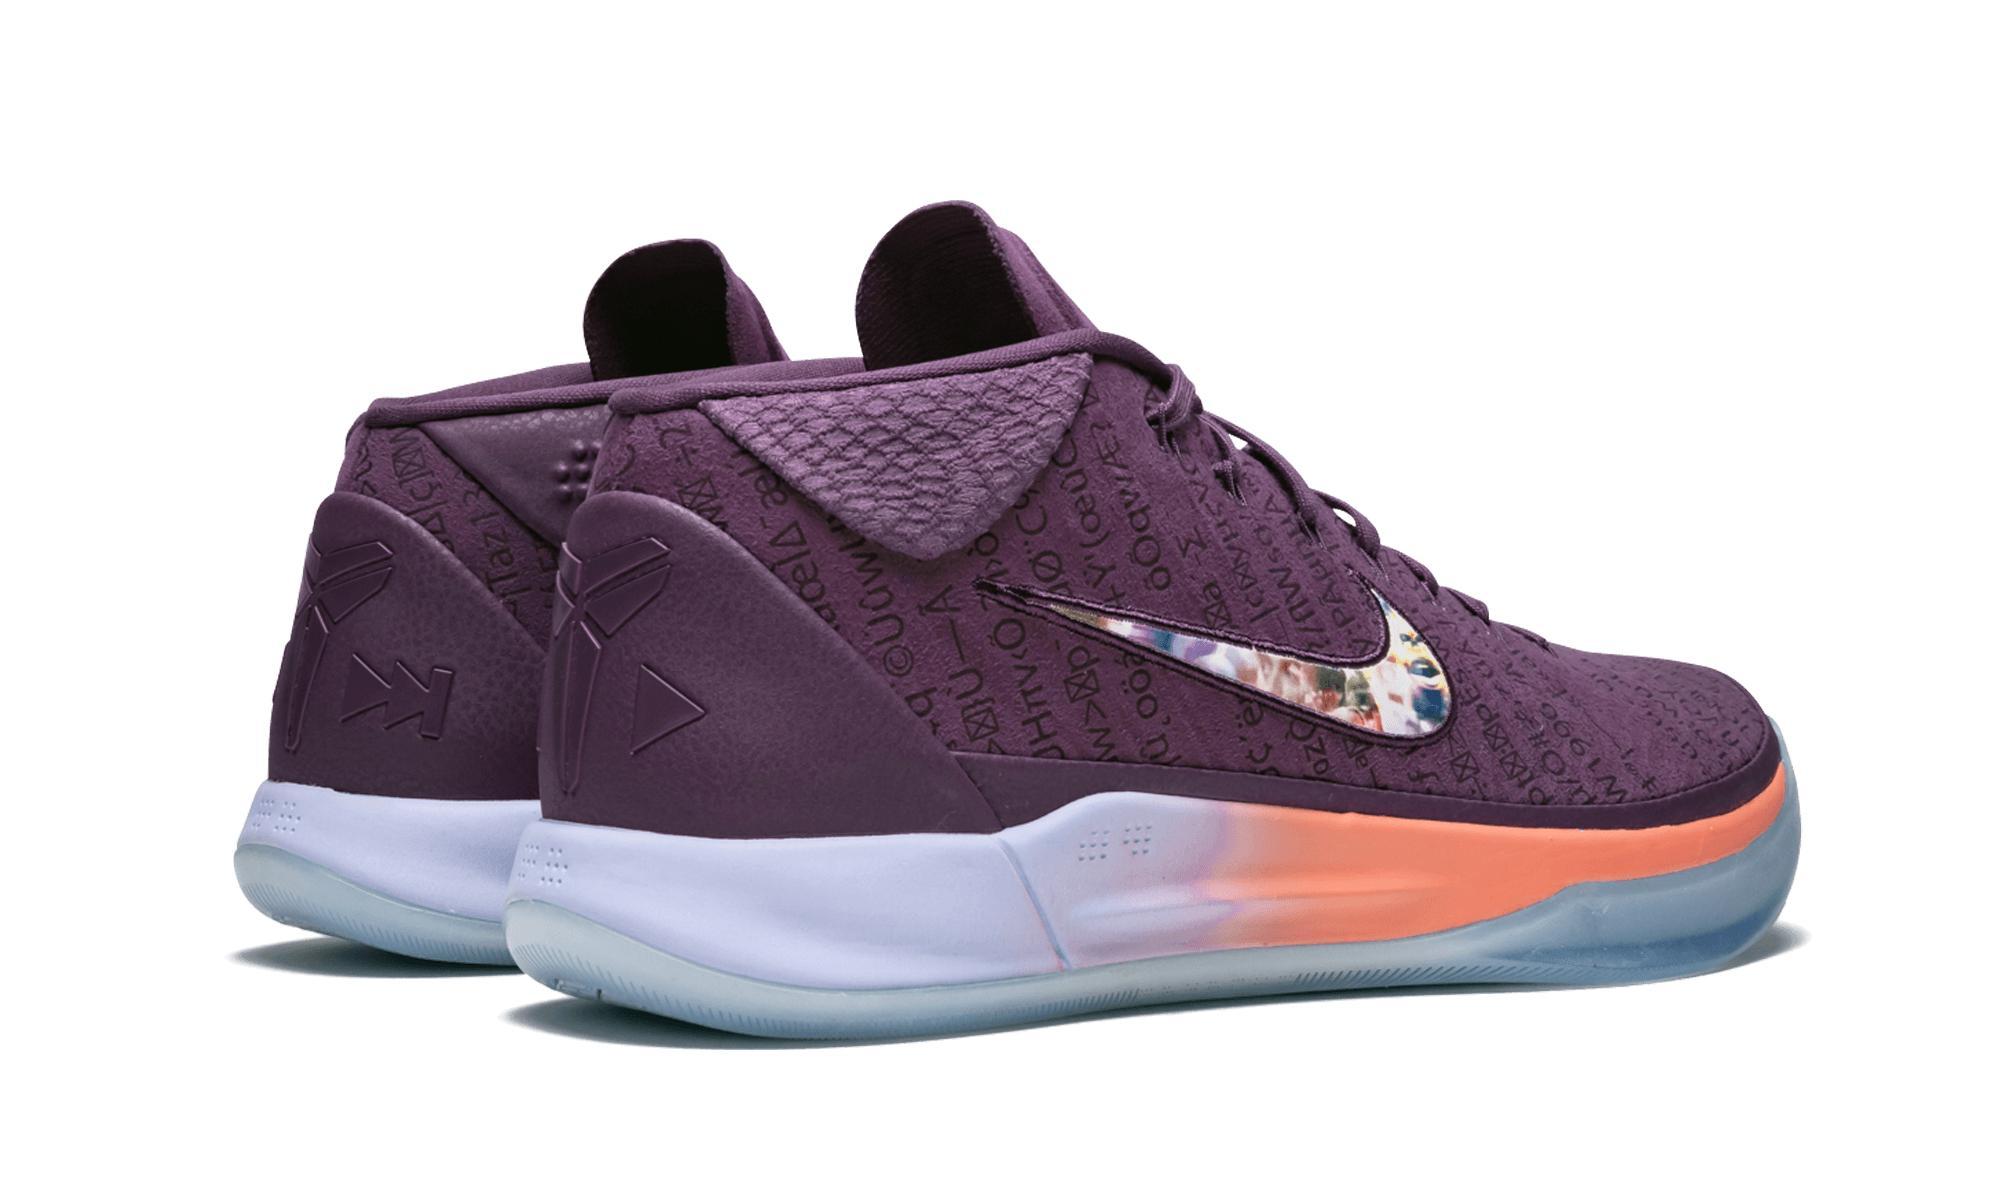 brand new 64c7b 85d48 Nike Purple Kobe Ad Pe - Size 10.5 for men